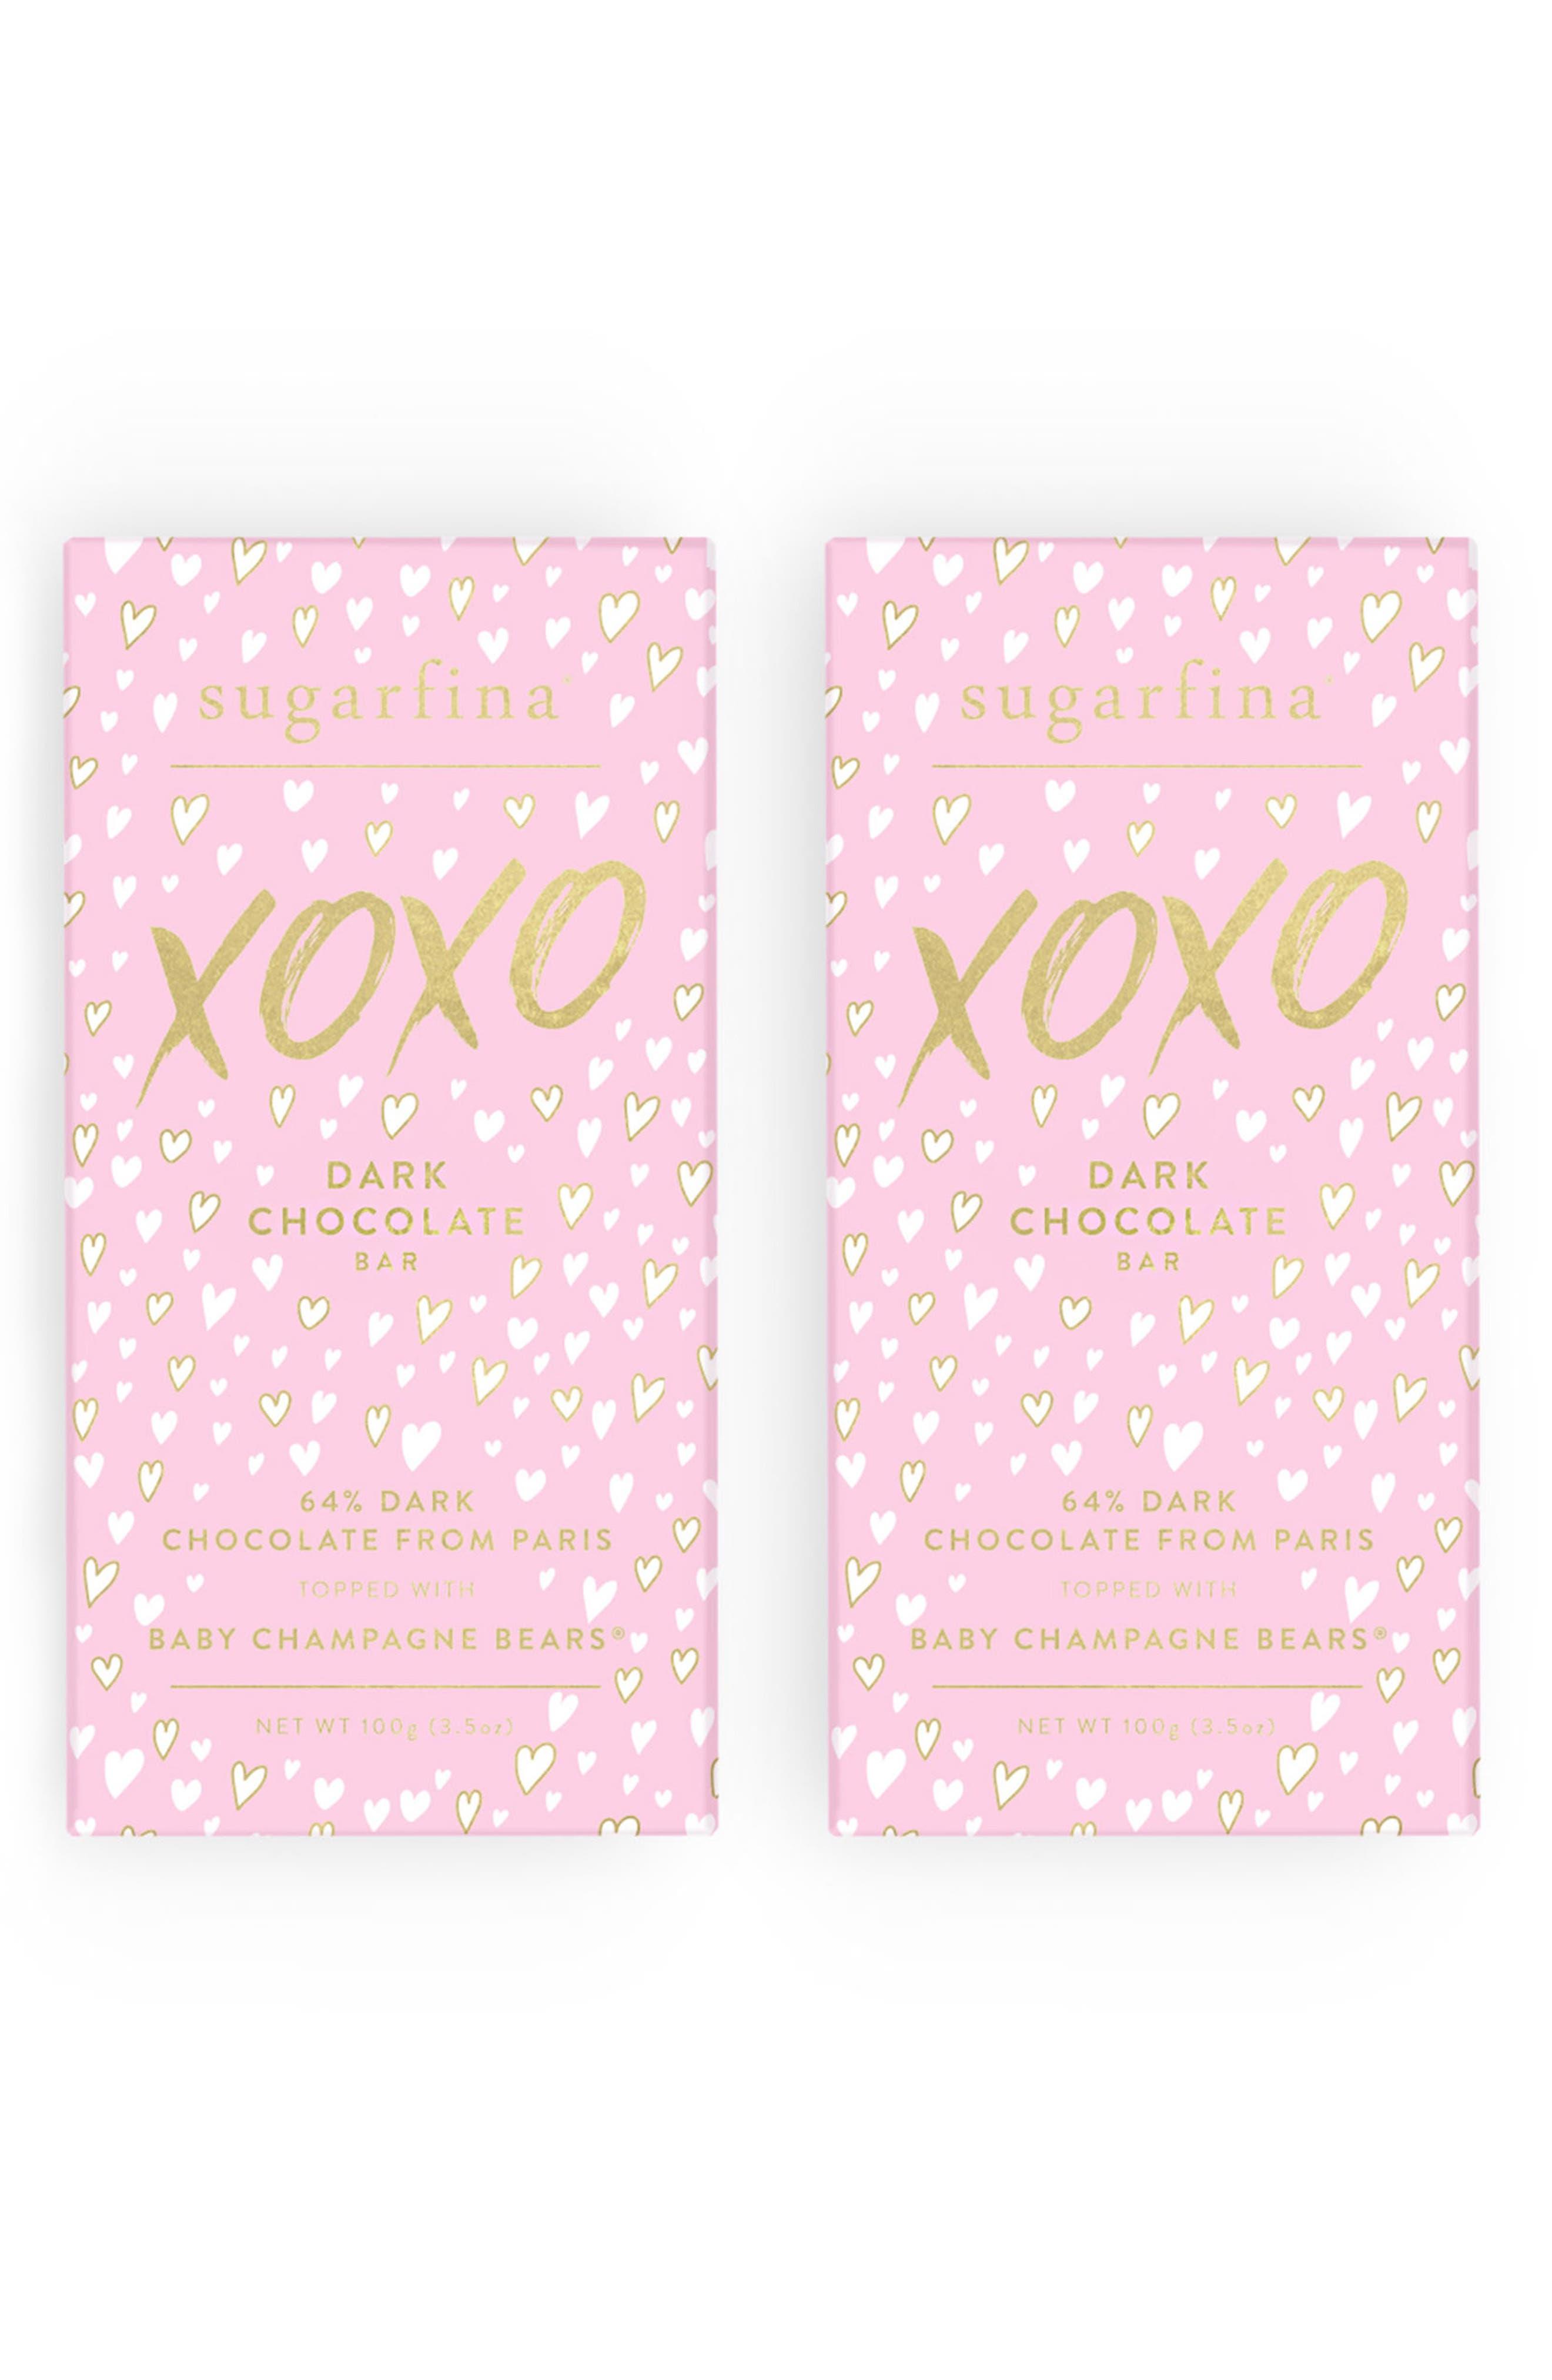 XOXO 2-Pack Dark Chocolate Baby Champagne Bears<sup>®</sup> Bars,                             Main thumbnail 1, color,                             650